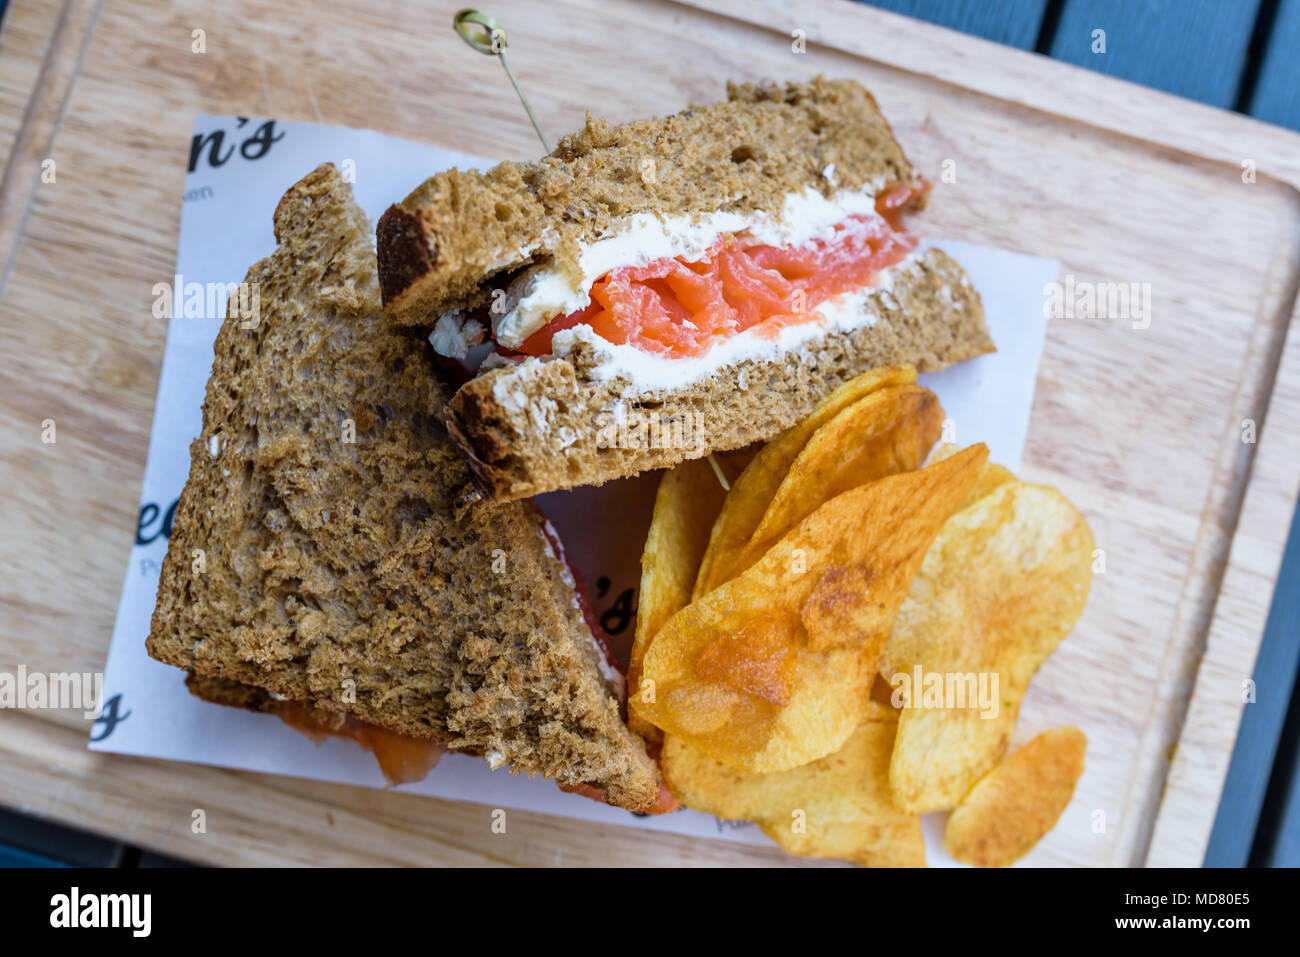 Salmon and cream cheese sandwich - Stock Image